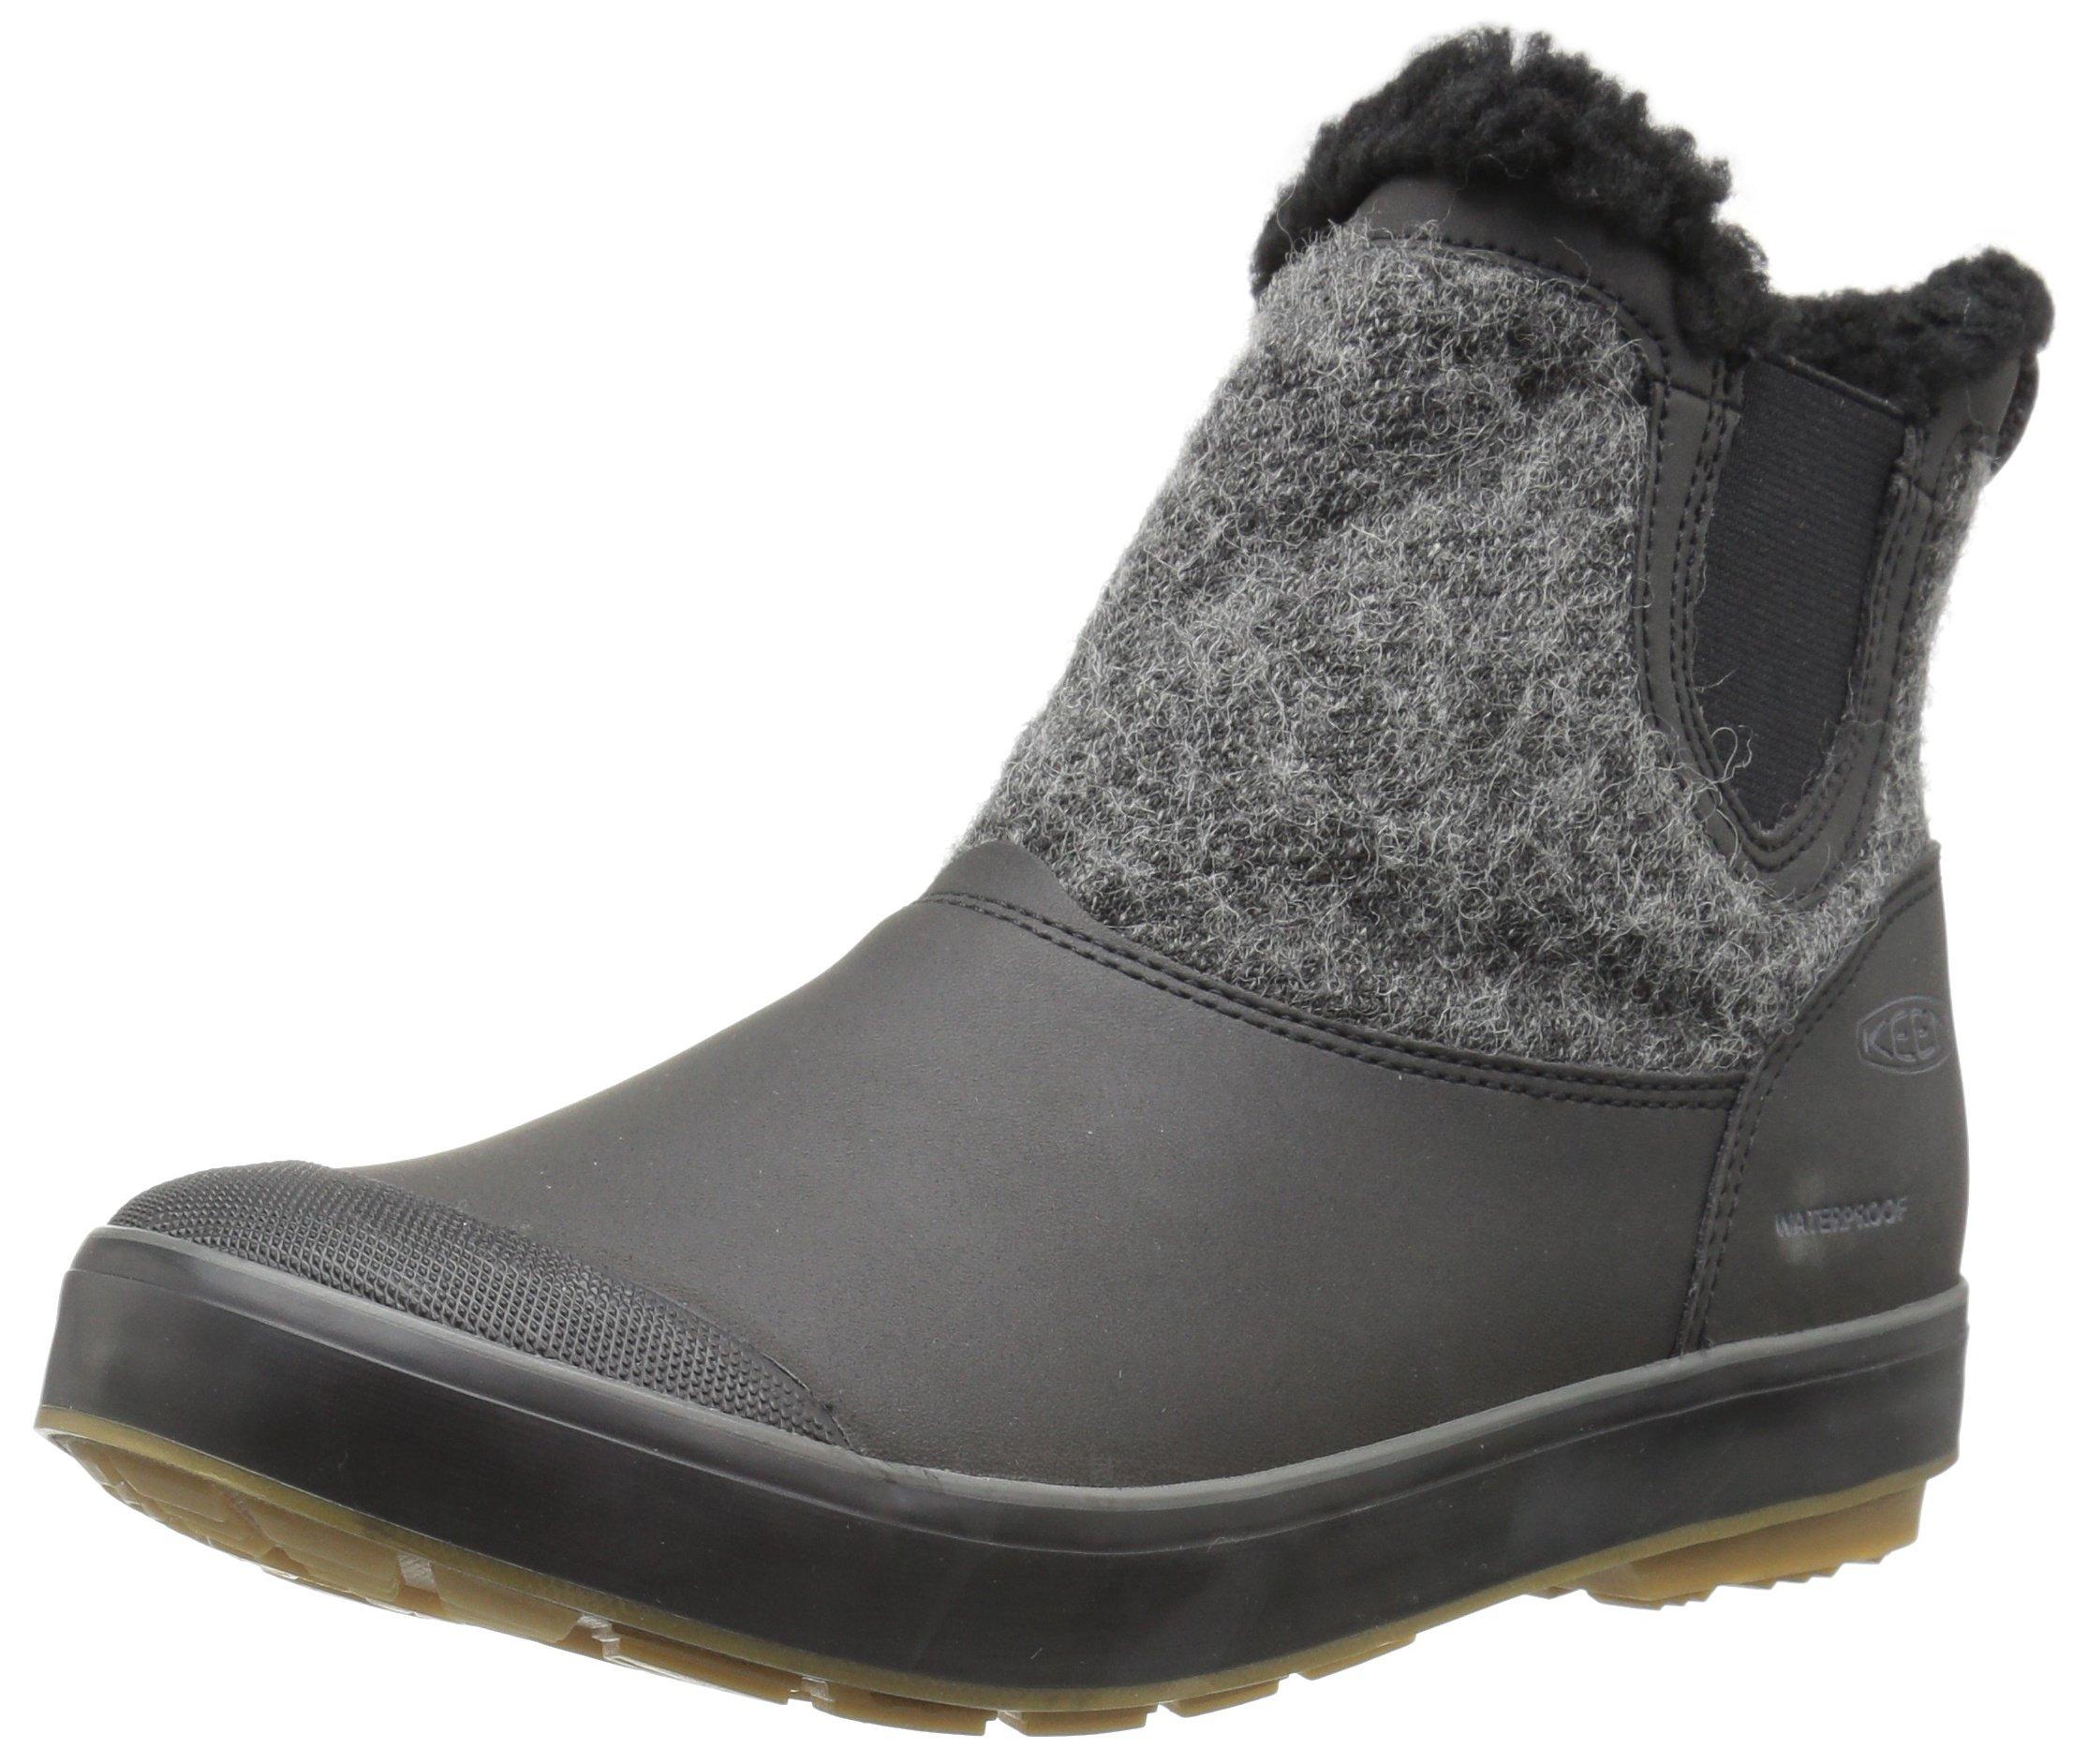 KEEN Women's Elsa Chelsea WP-w Snow Boot, Black Wool, 8 M US